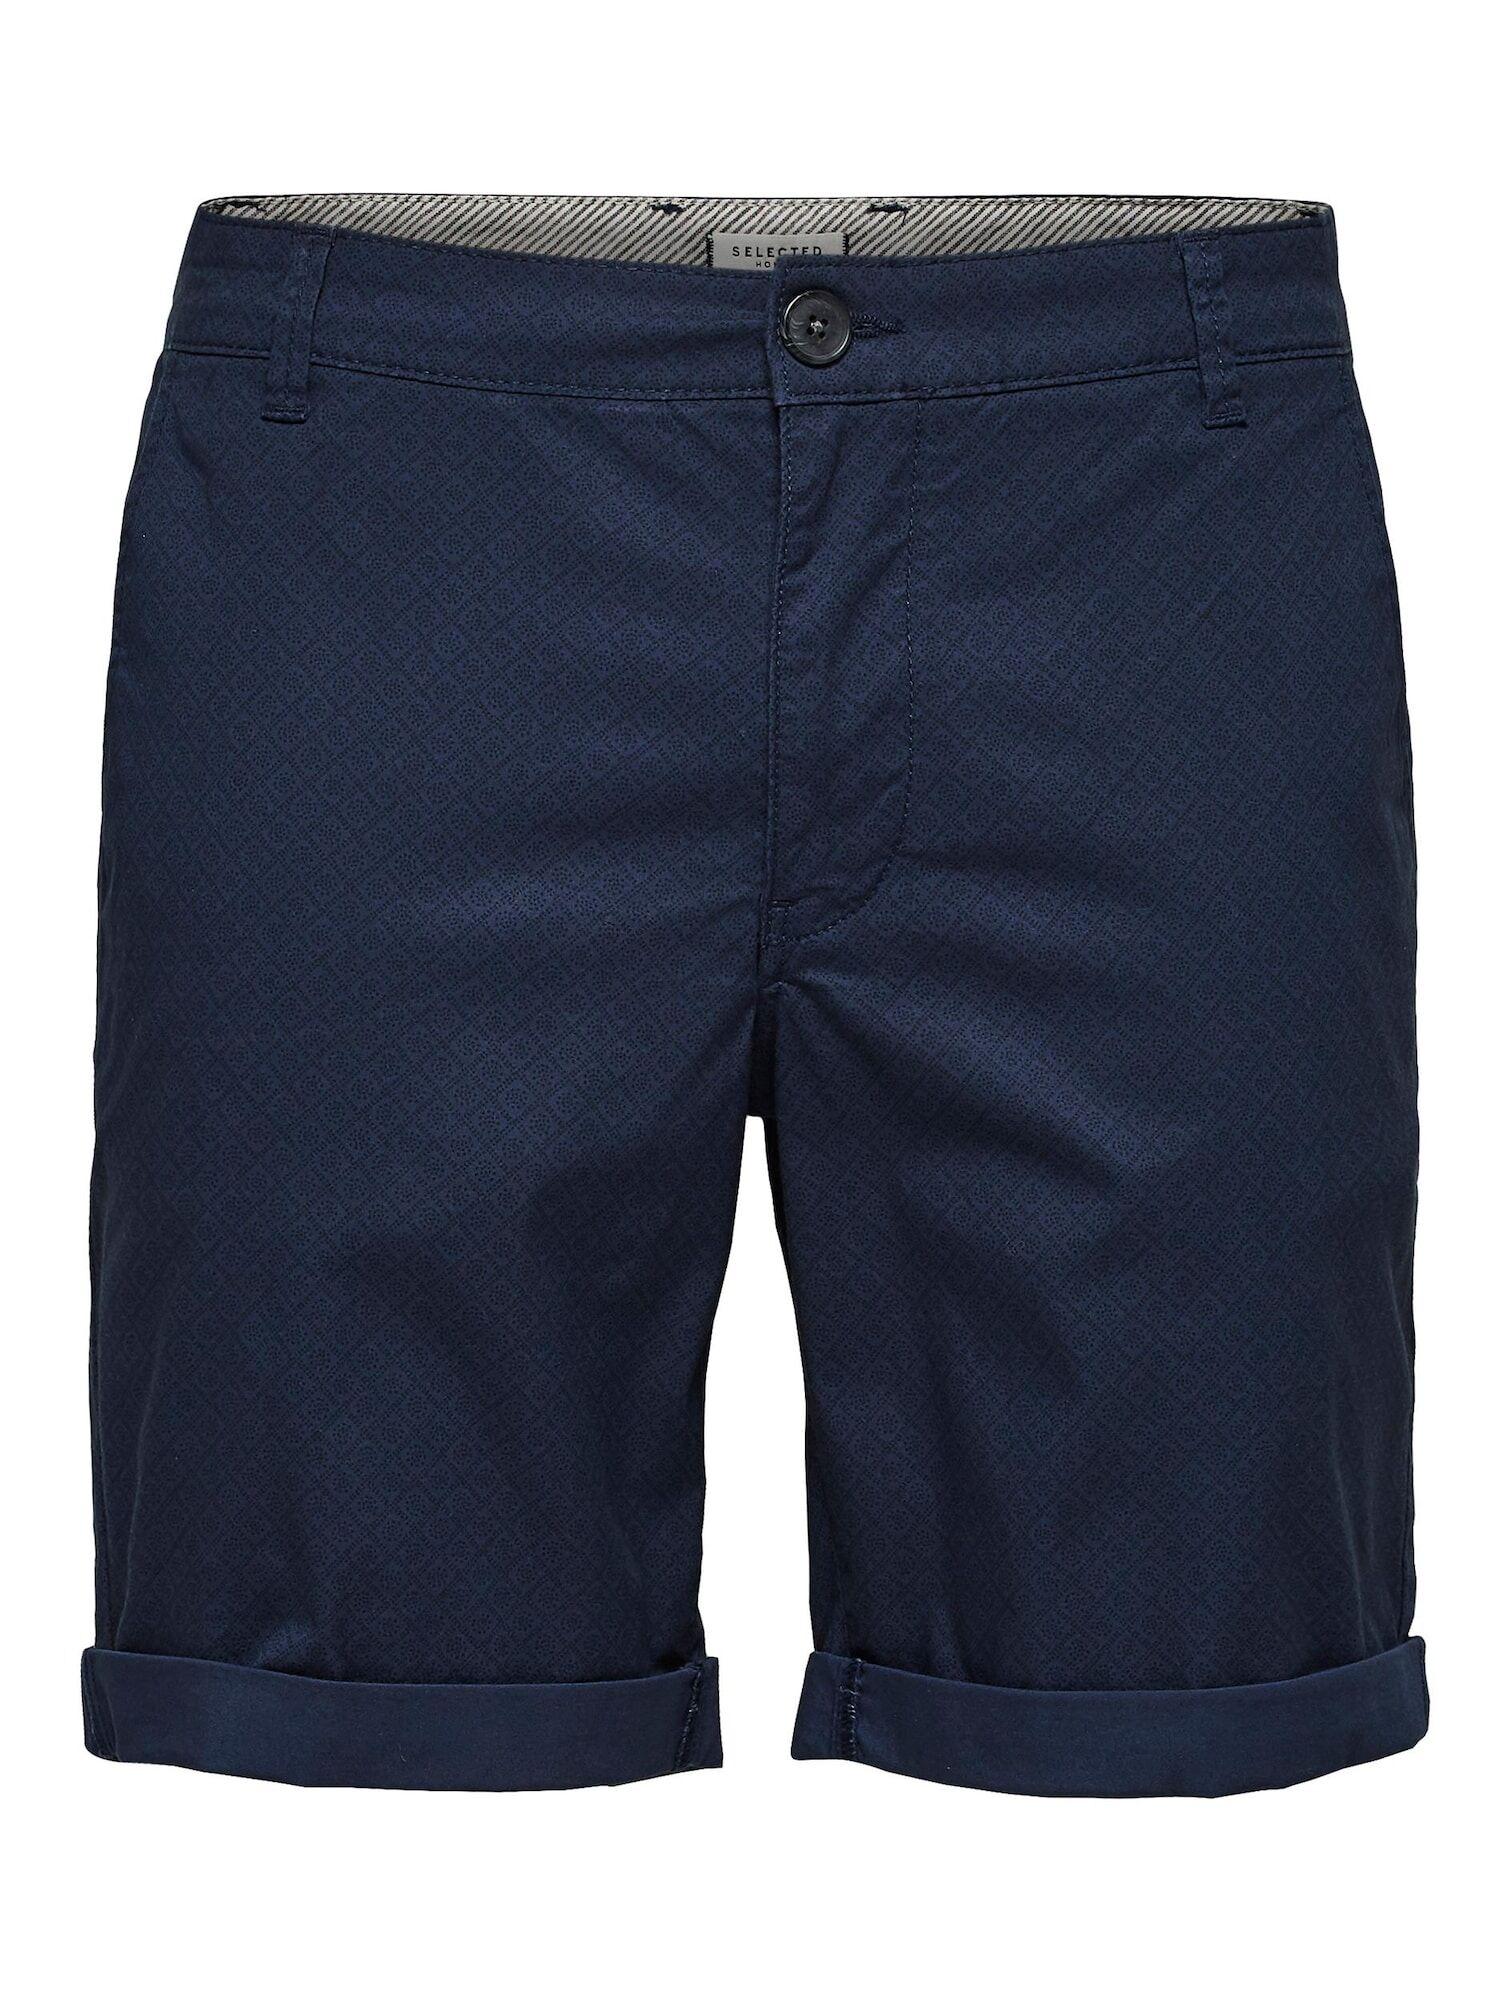 SELECTED HOMME Pantalon chino 'Paris'  - Bleu - Taille: XL - male